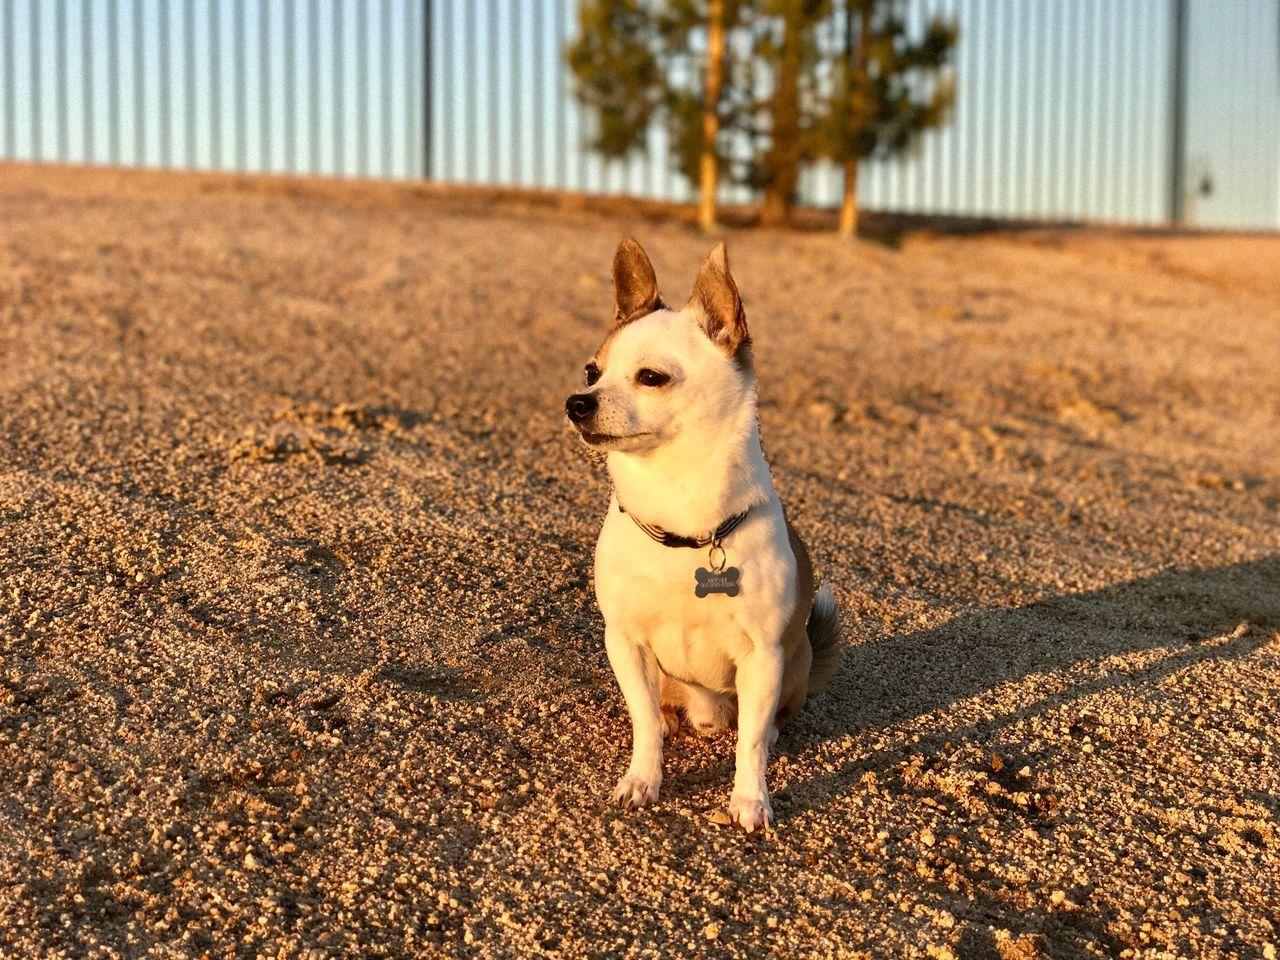 Martini -Dog Park Pets Dog Outdoors No People Sitting Chihuahua